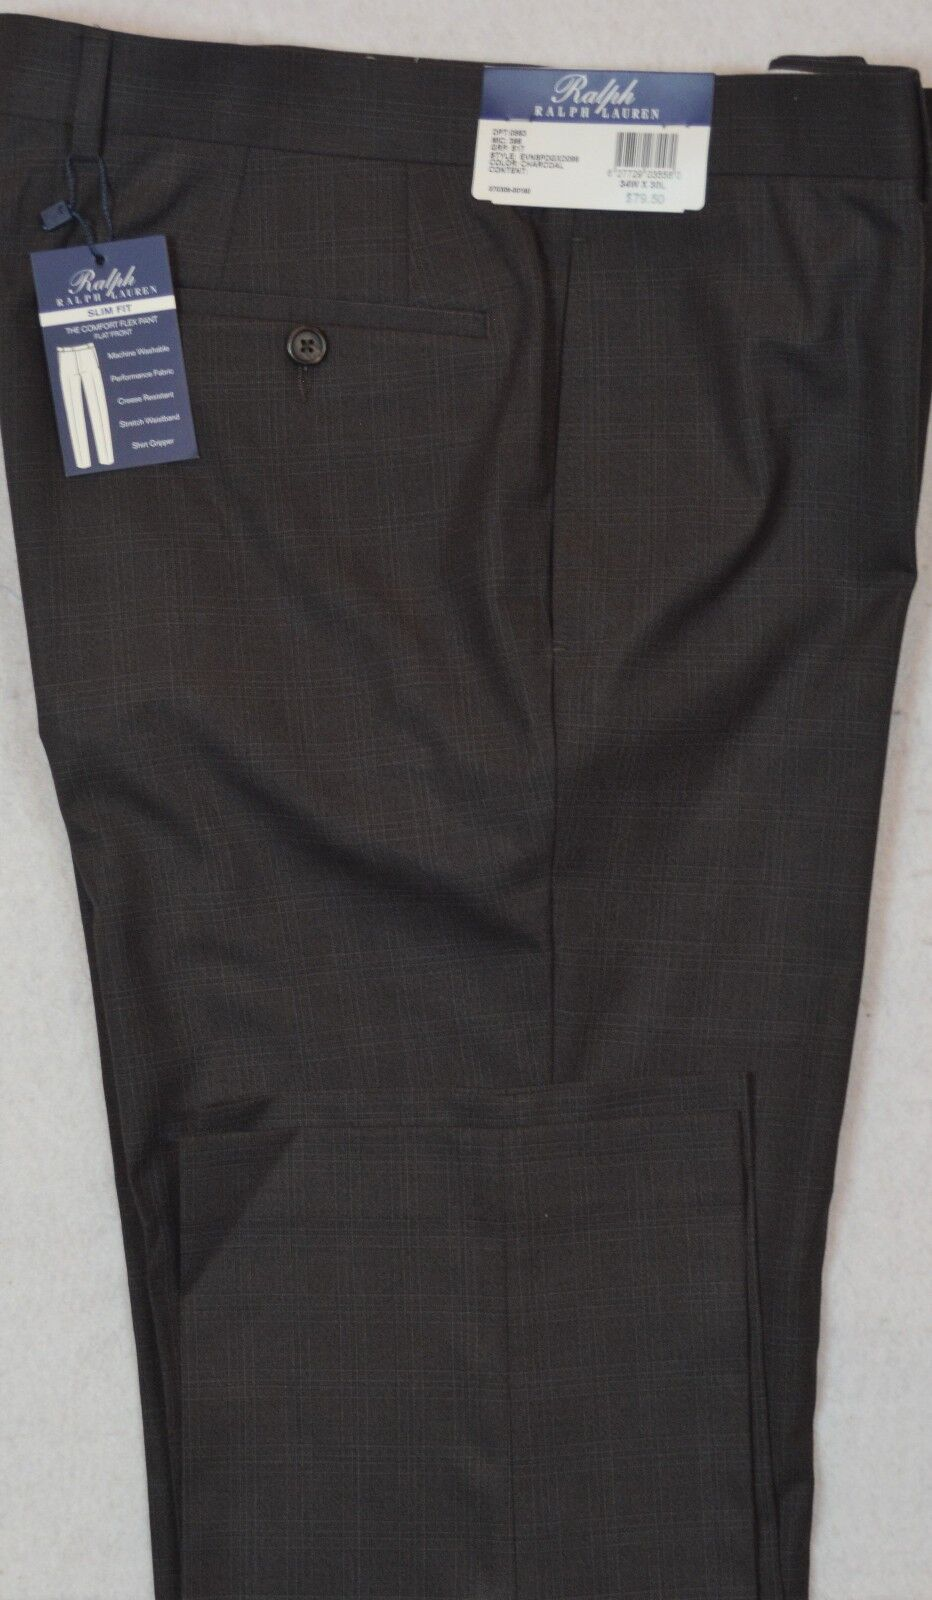 Ralph Lauren Comfort Flex Slim Fit Flat Front Dress Pant 42 30 42 32 NWT